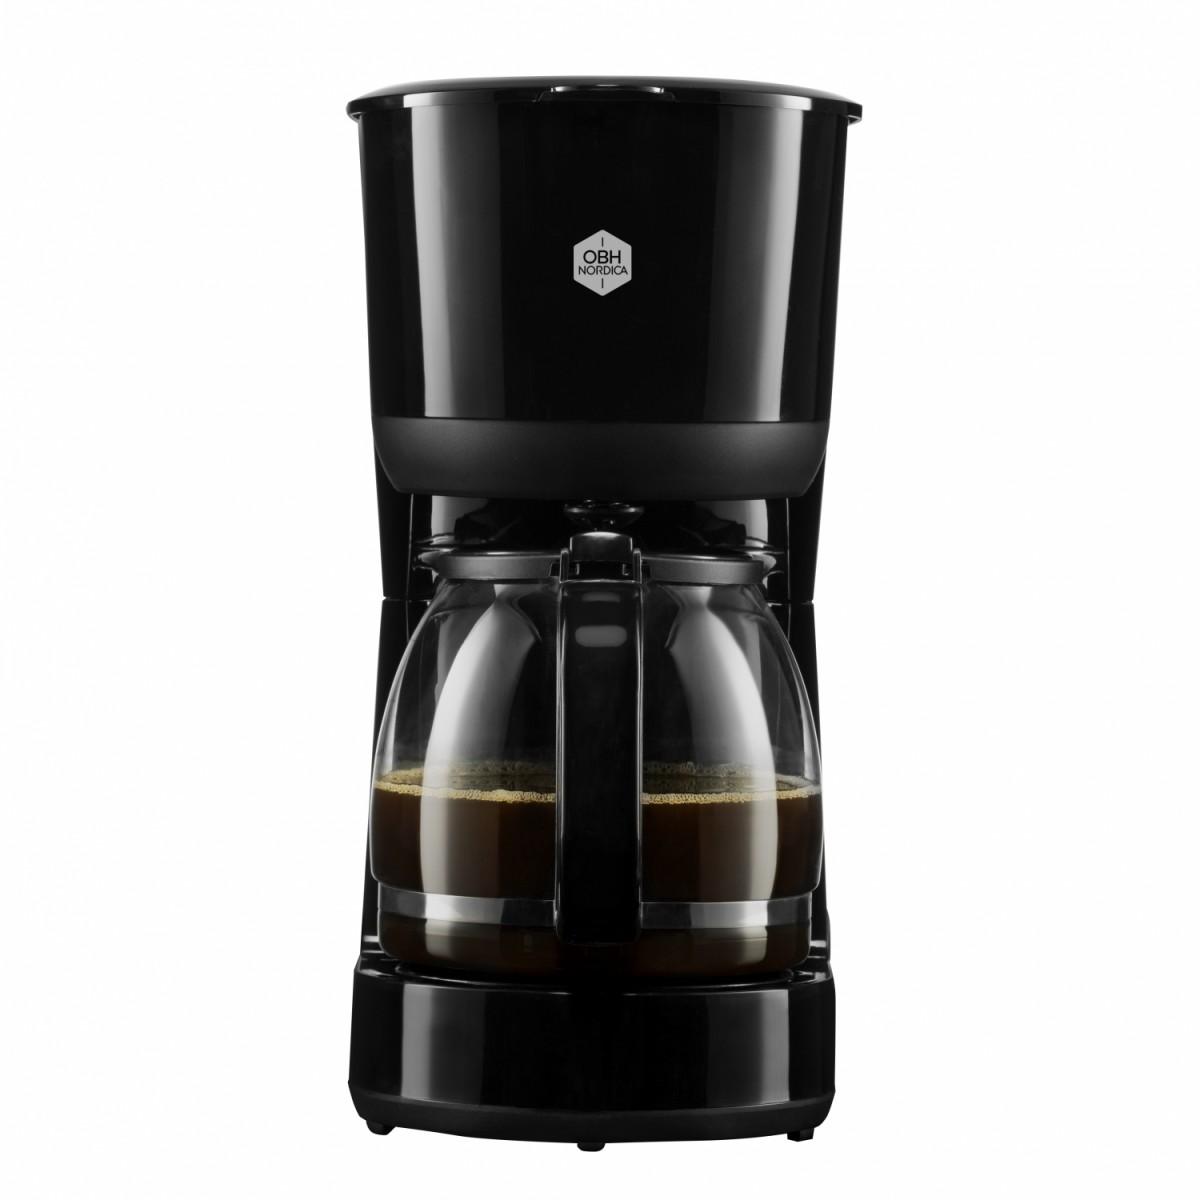 OBH NORDICA Kaffemaskine daybreak sort